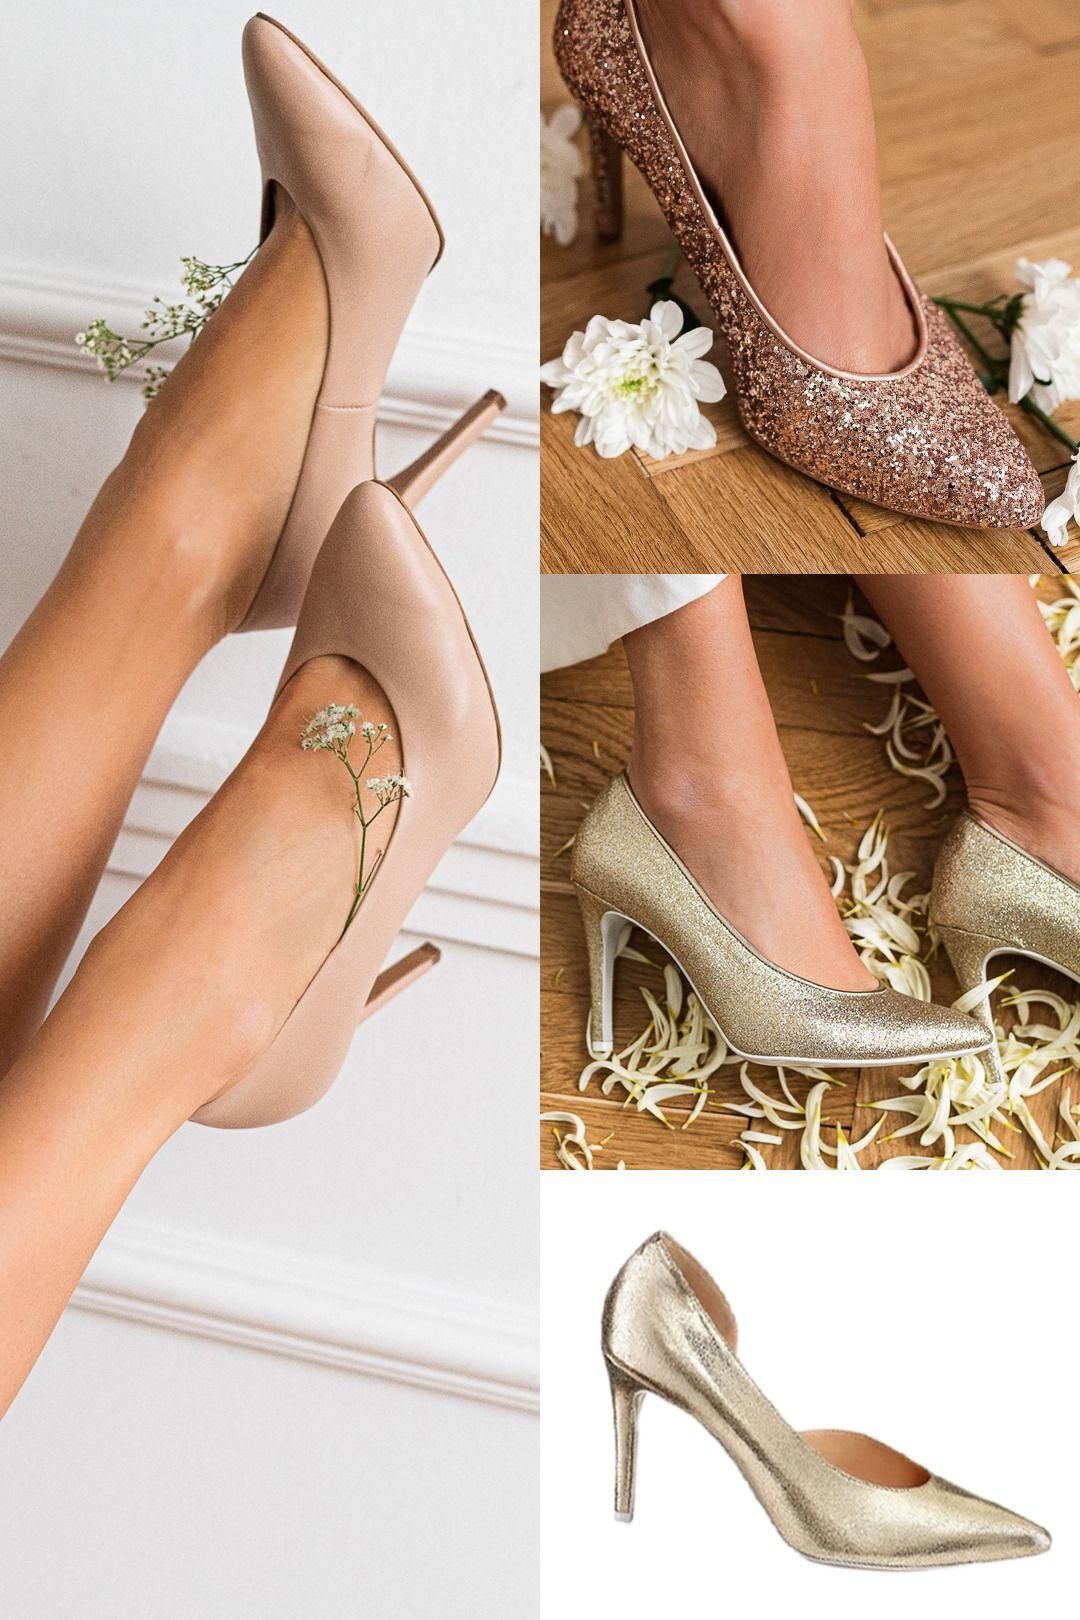 Jak Wybrac Buty Slubne Shoes Wedding Dresses Dresses